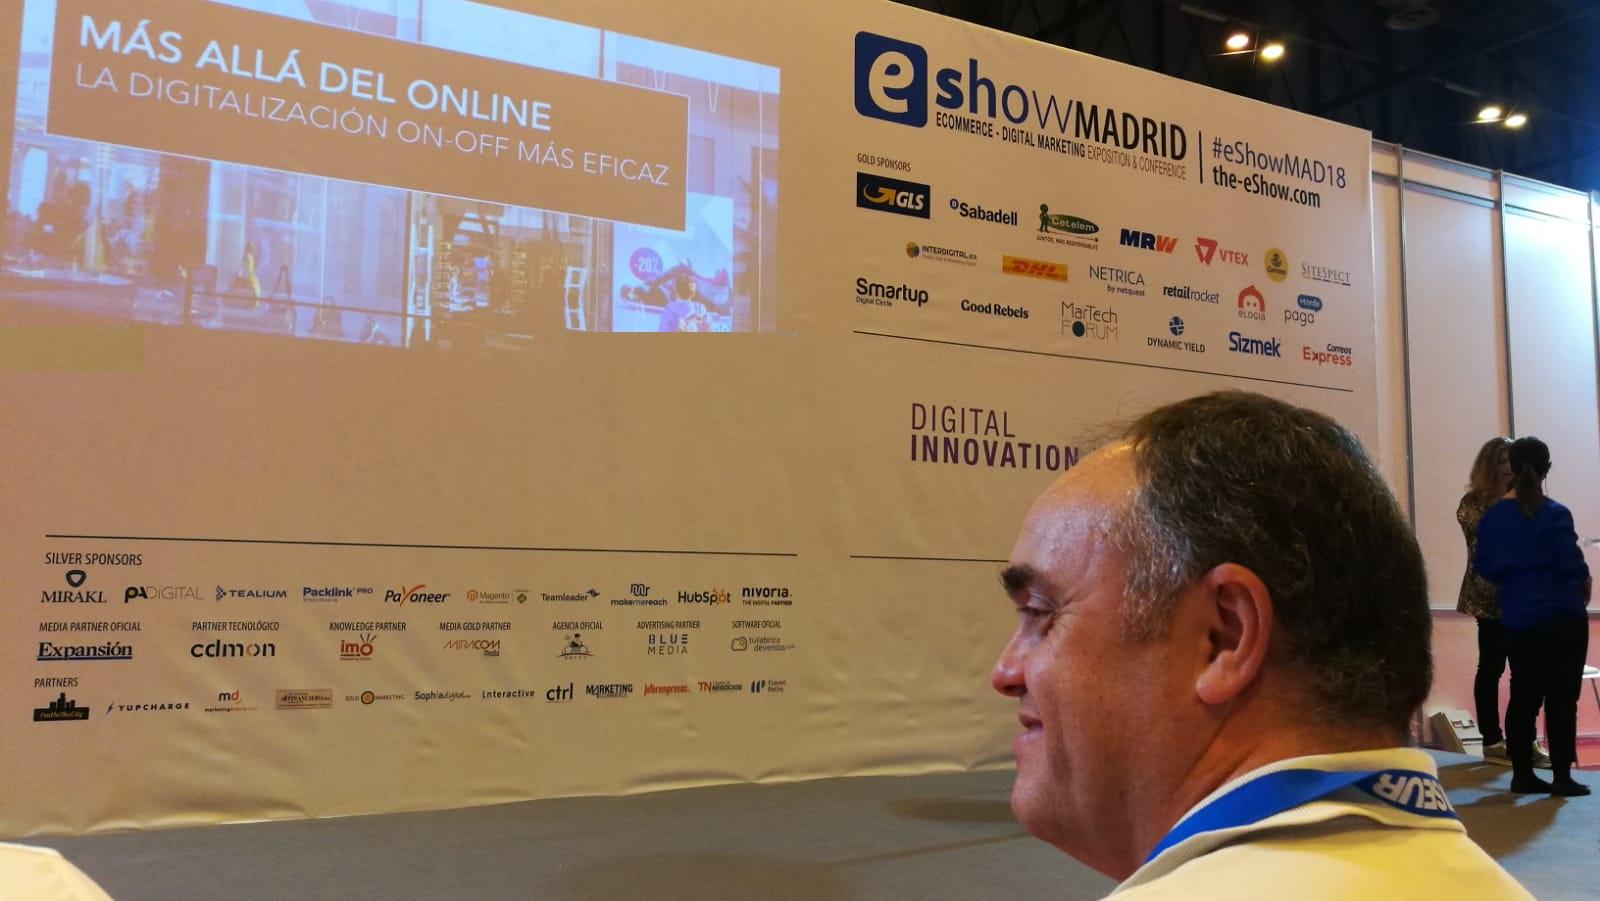 Intensas Networks Eshow Madrid 2018 Segunda Jornada- inteligencia artificial Jose Santos